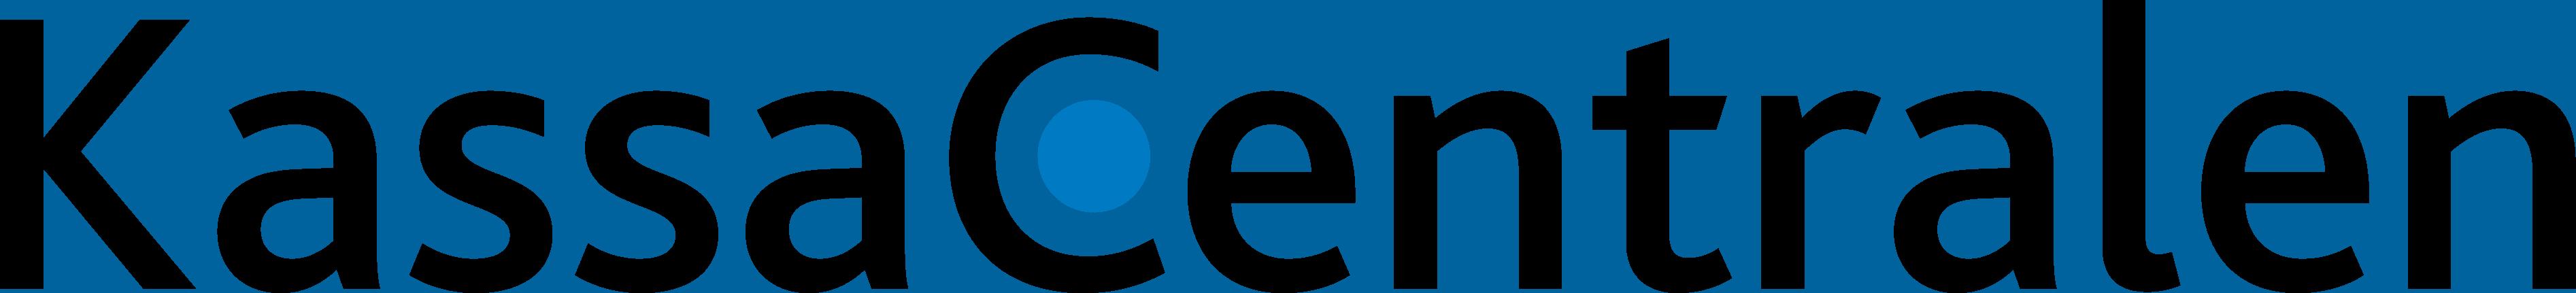 Kassacentralen logo